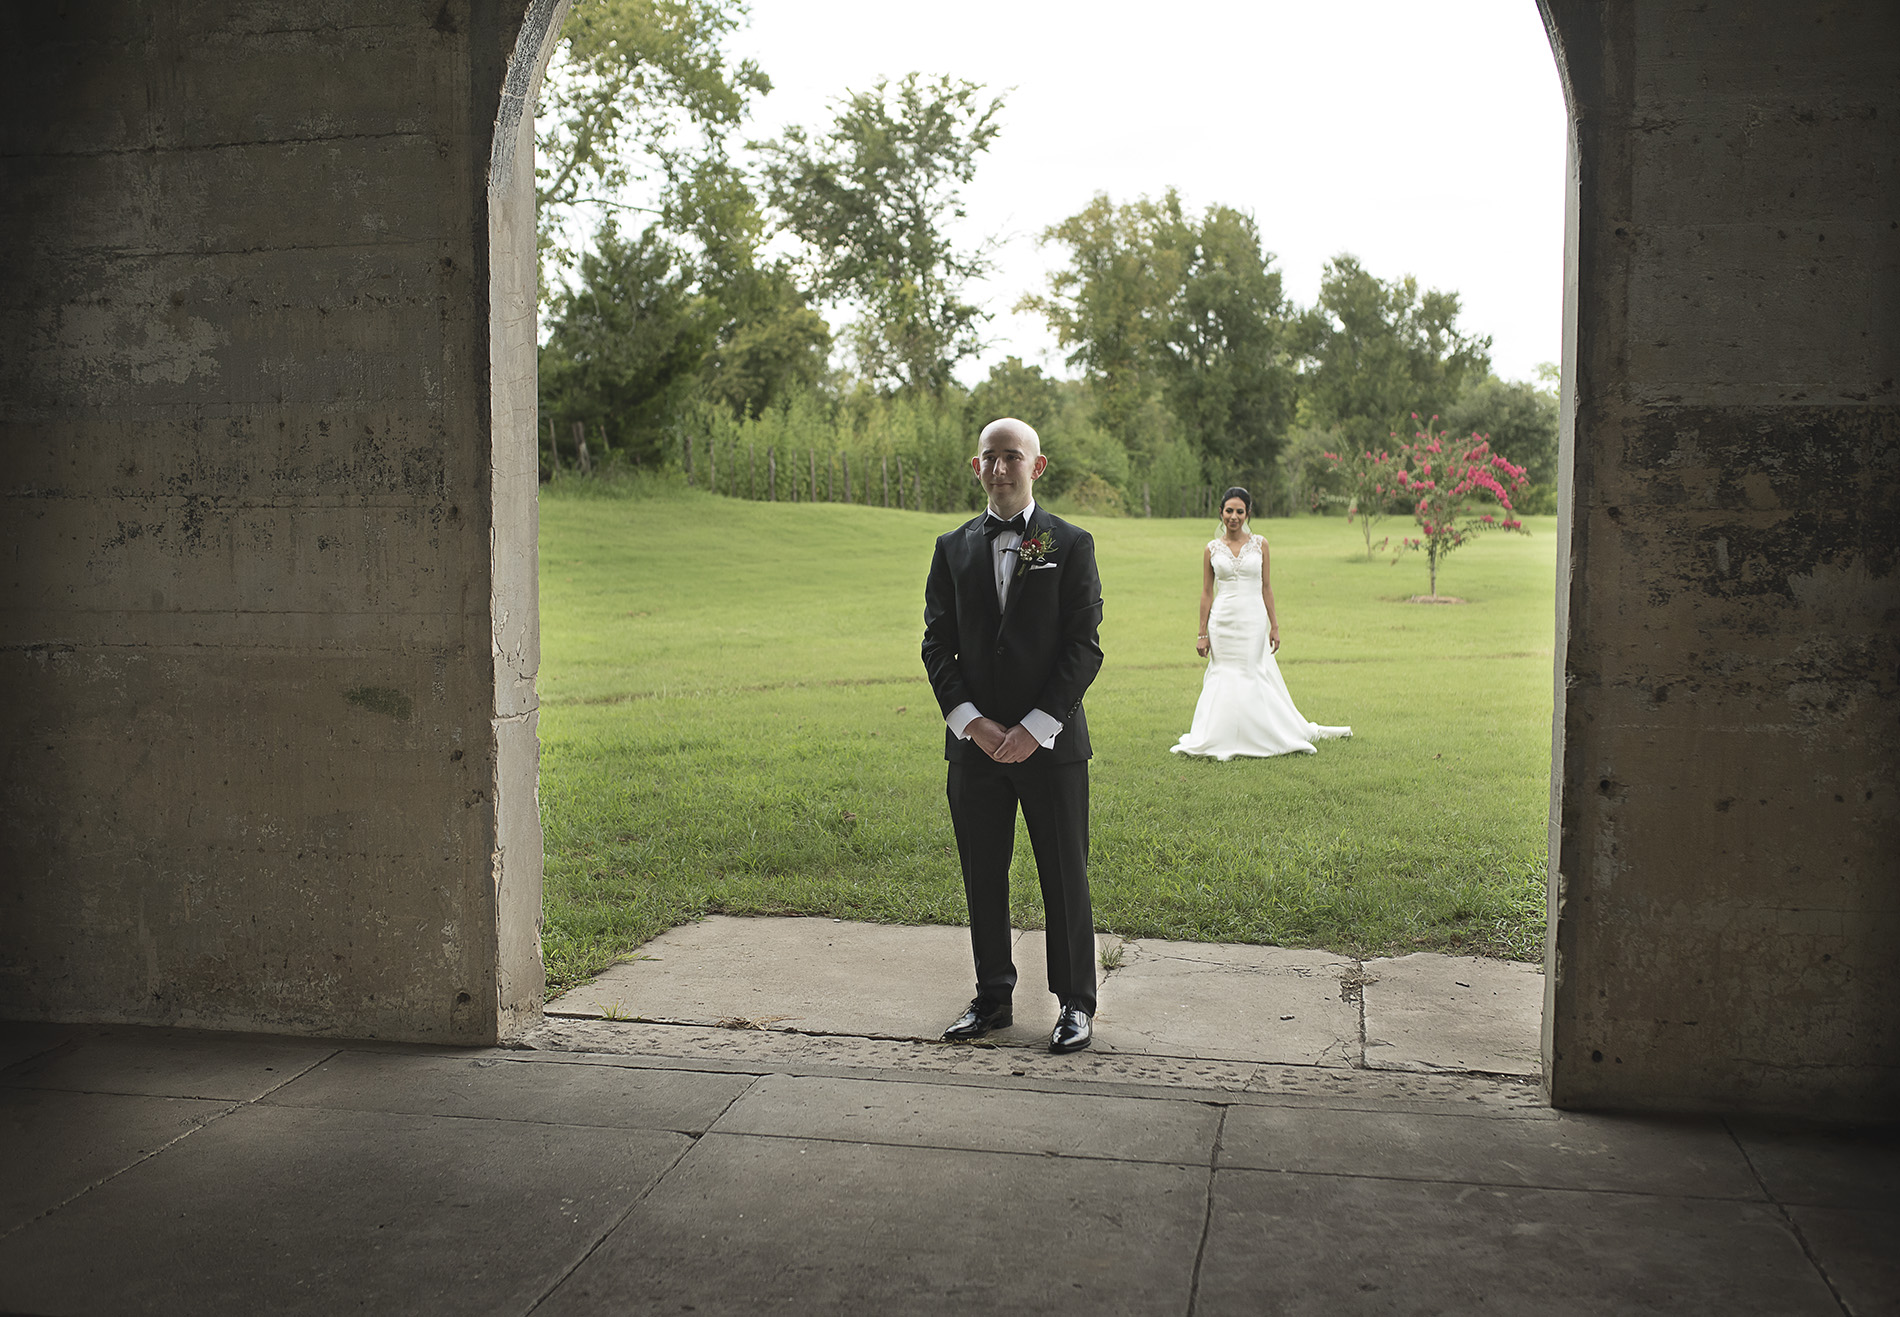 Houston-venue-Olde-Dobbin-Station-Romantic-Classic-Wedding-Photographer-026.jpg